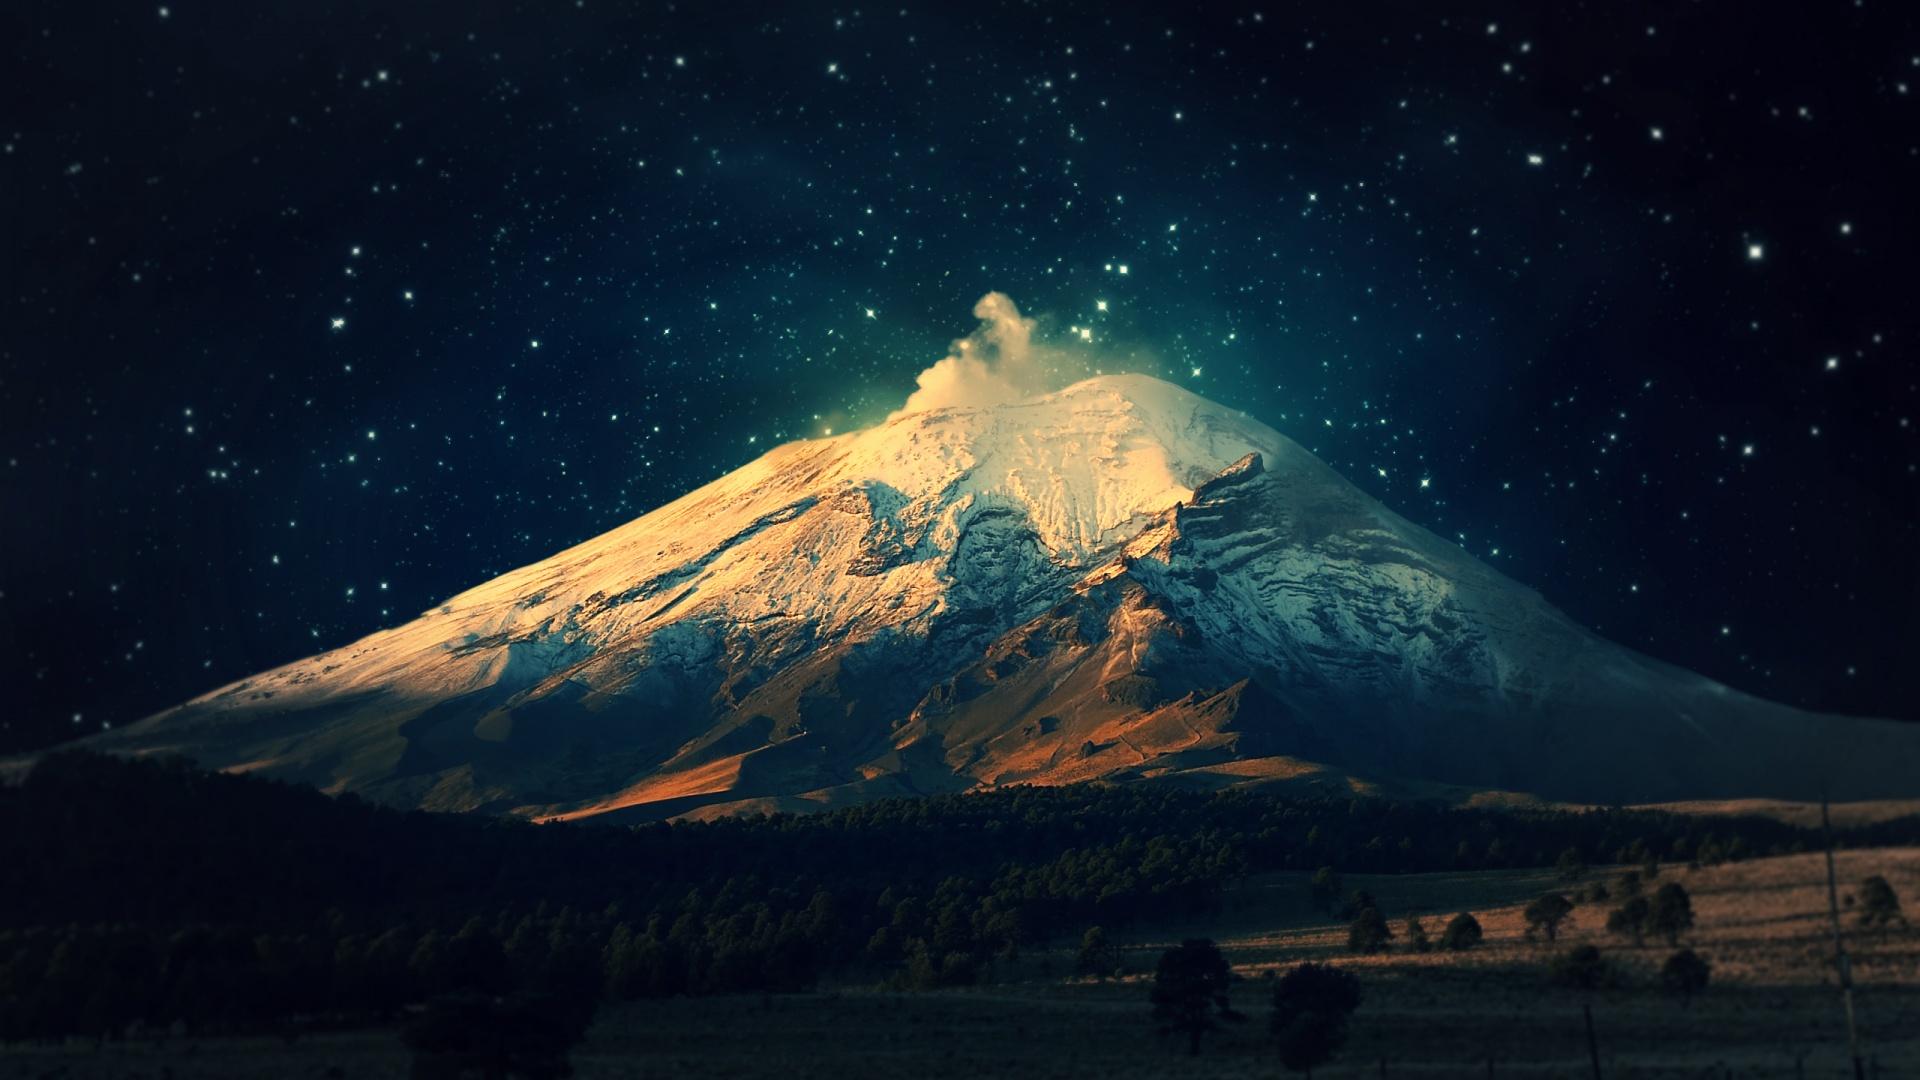 1920x1080 Snowy Mountain Starry Sky desktop PC and Mac wallpaper 1920x1080